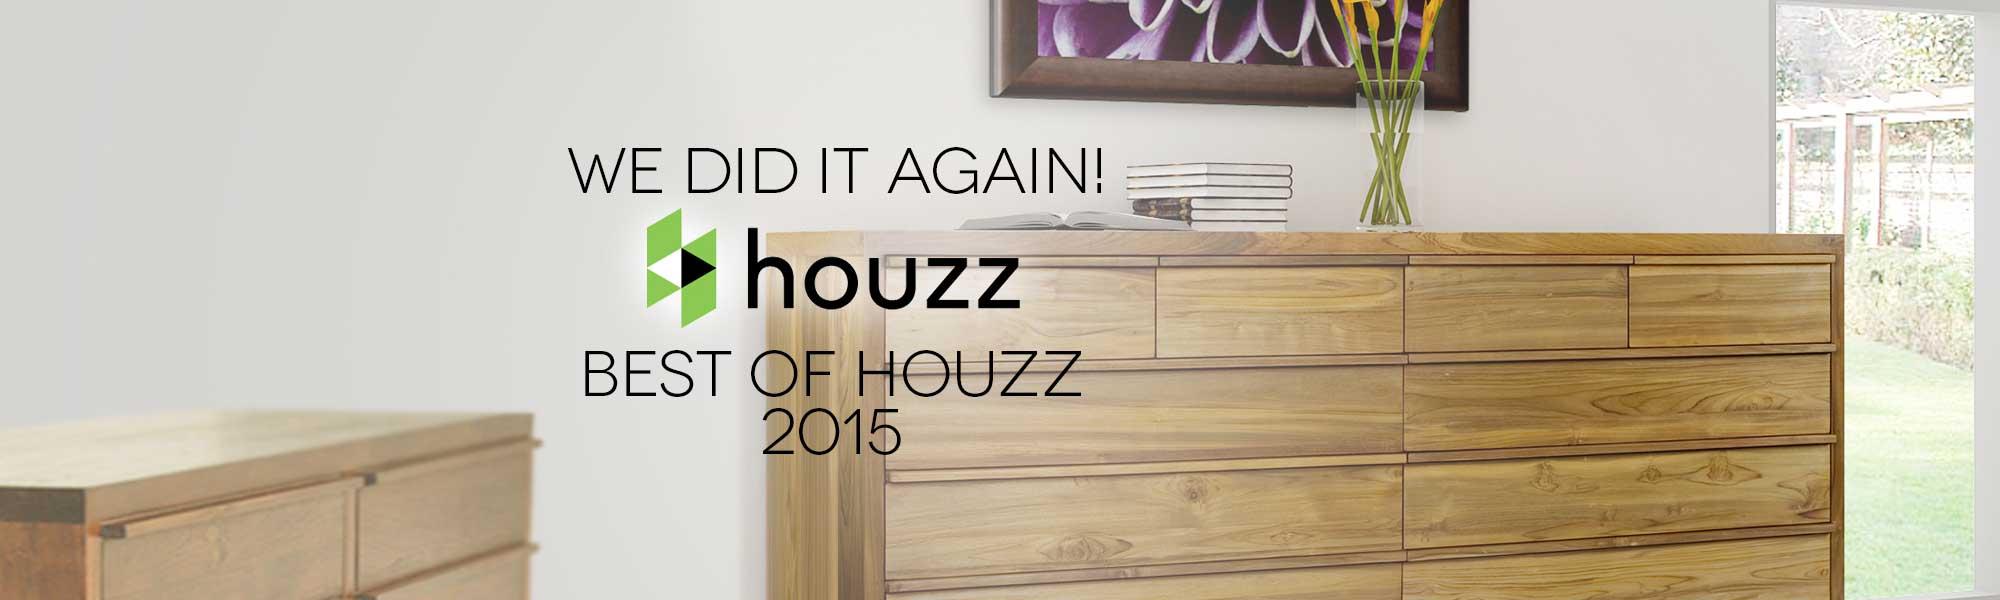 Houzz2015Slide